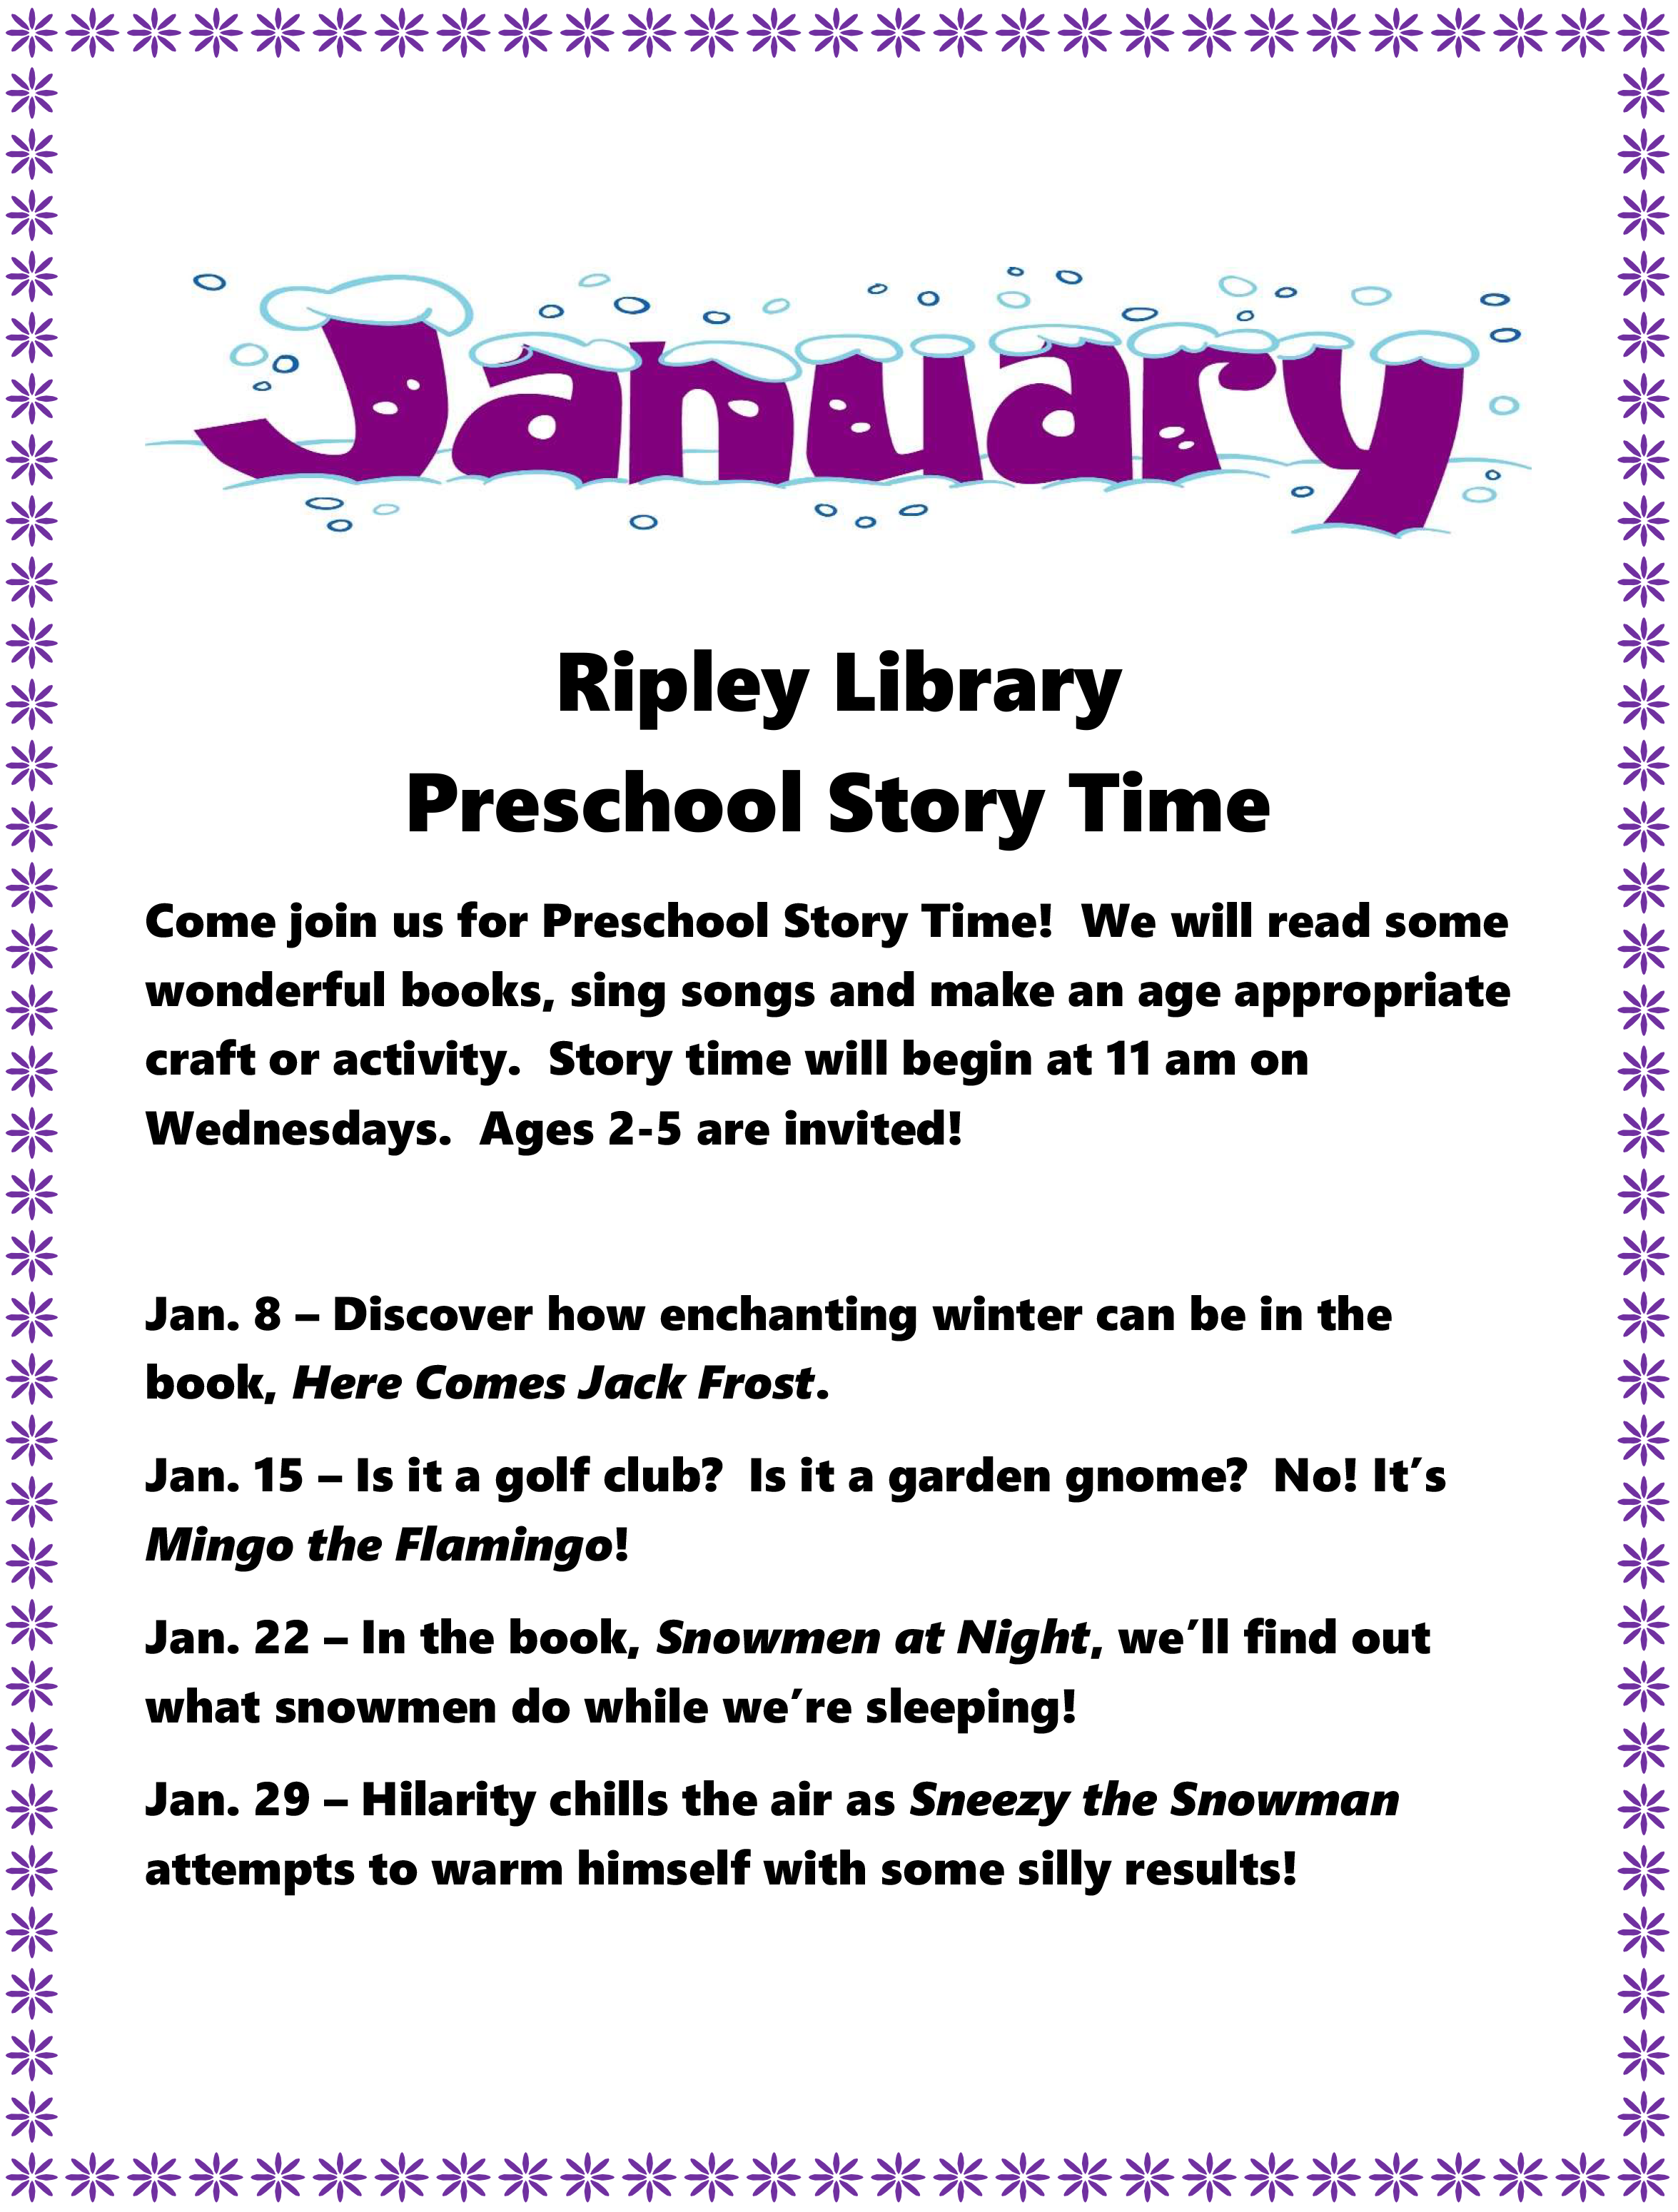 January Preschool Story Times - Ripley